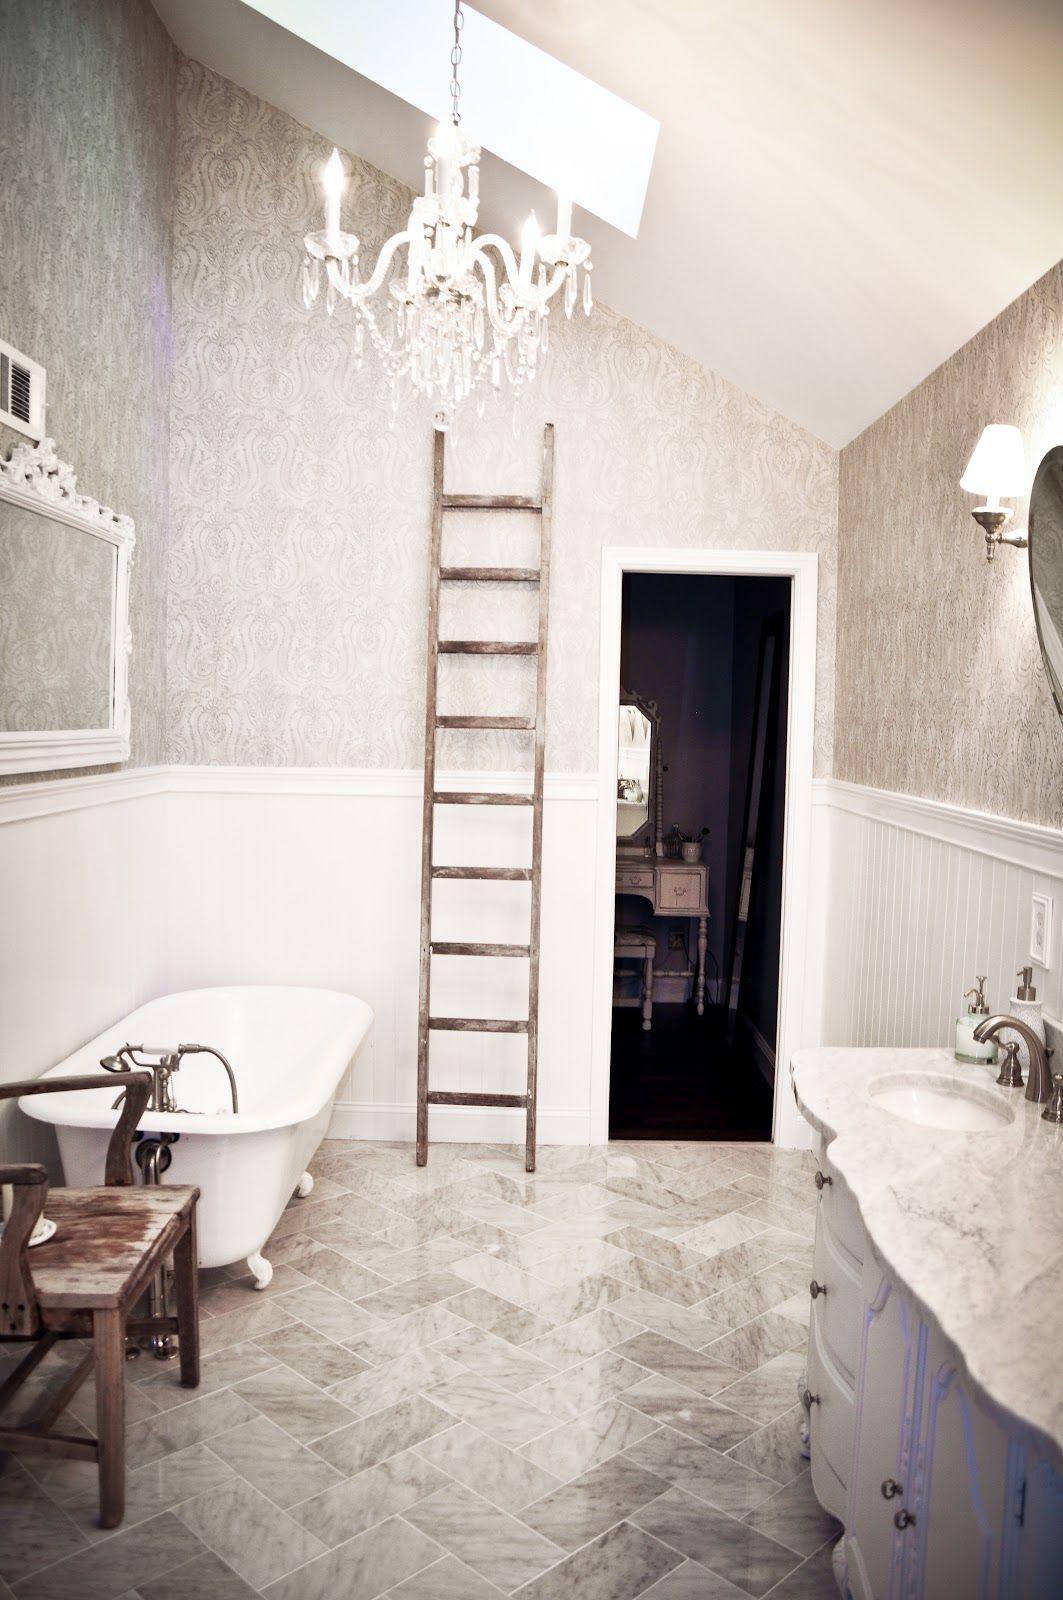 rustic farmhouse bathroom   Bathroom, Rustic farmhouse ... on Rustic Farmhouse Bathroom Tile  id=57007